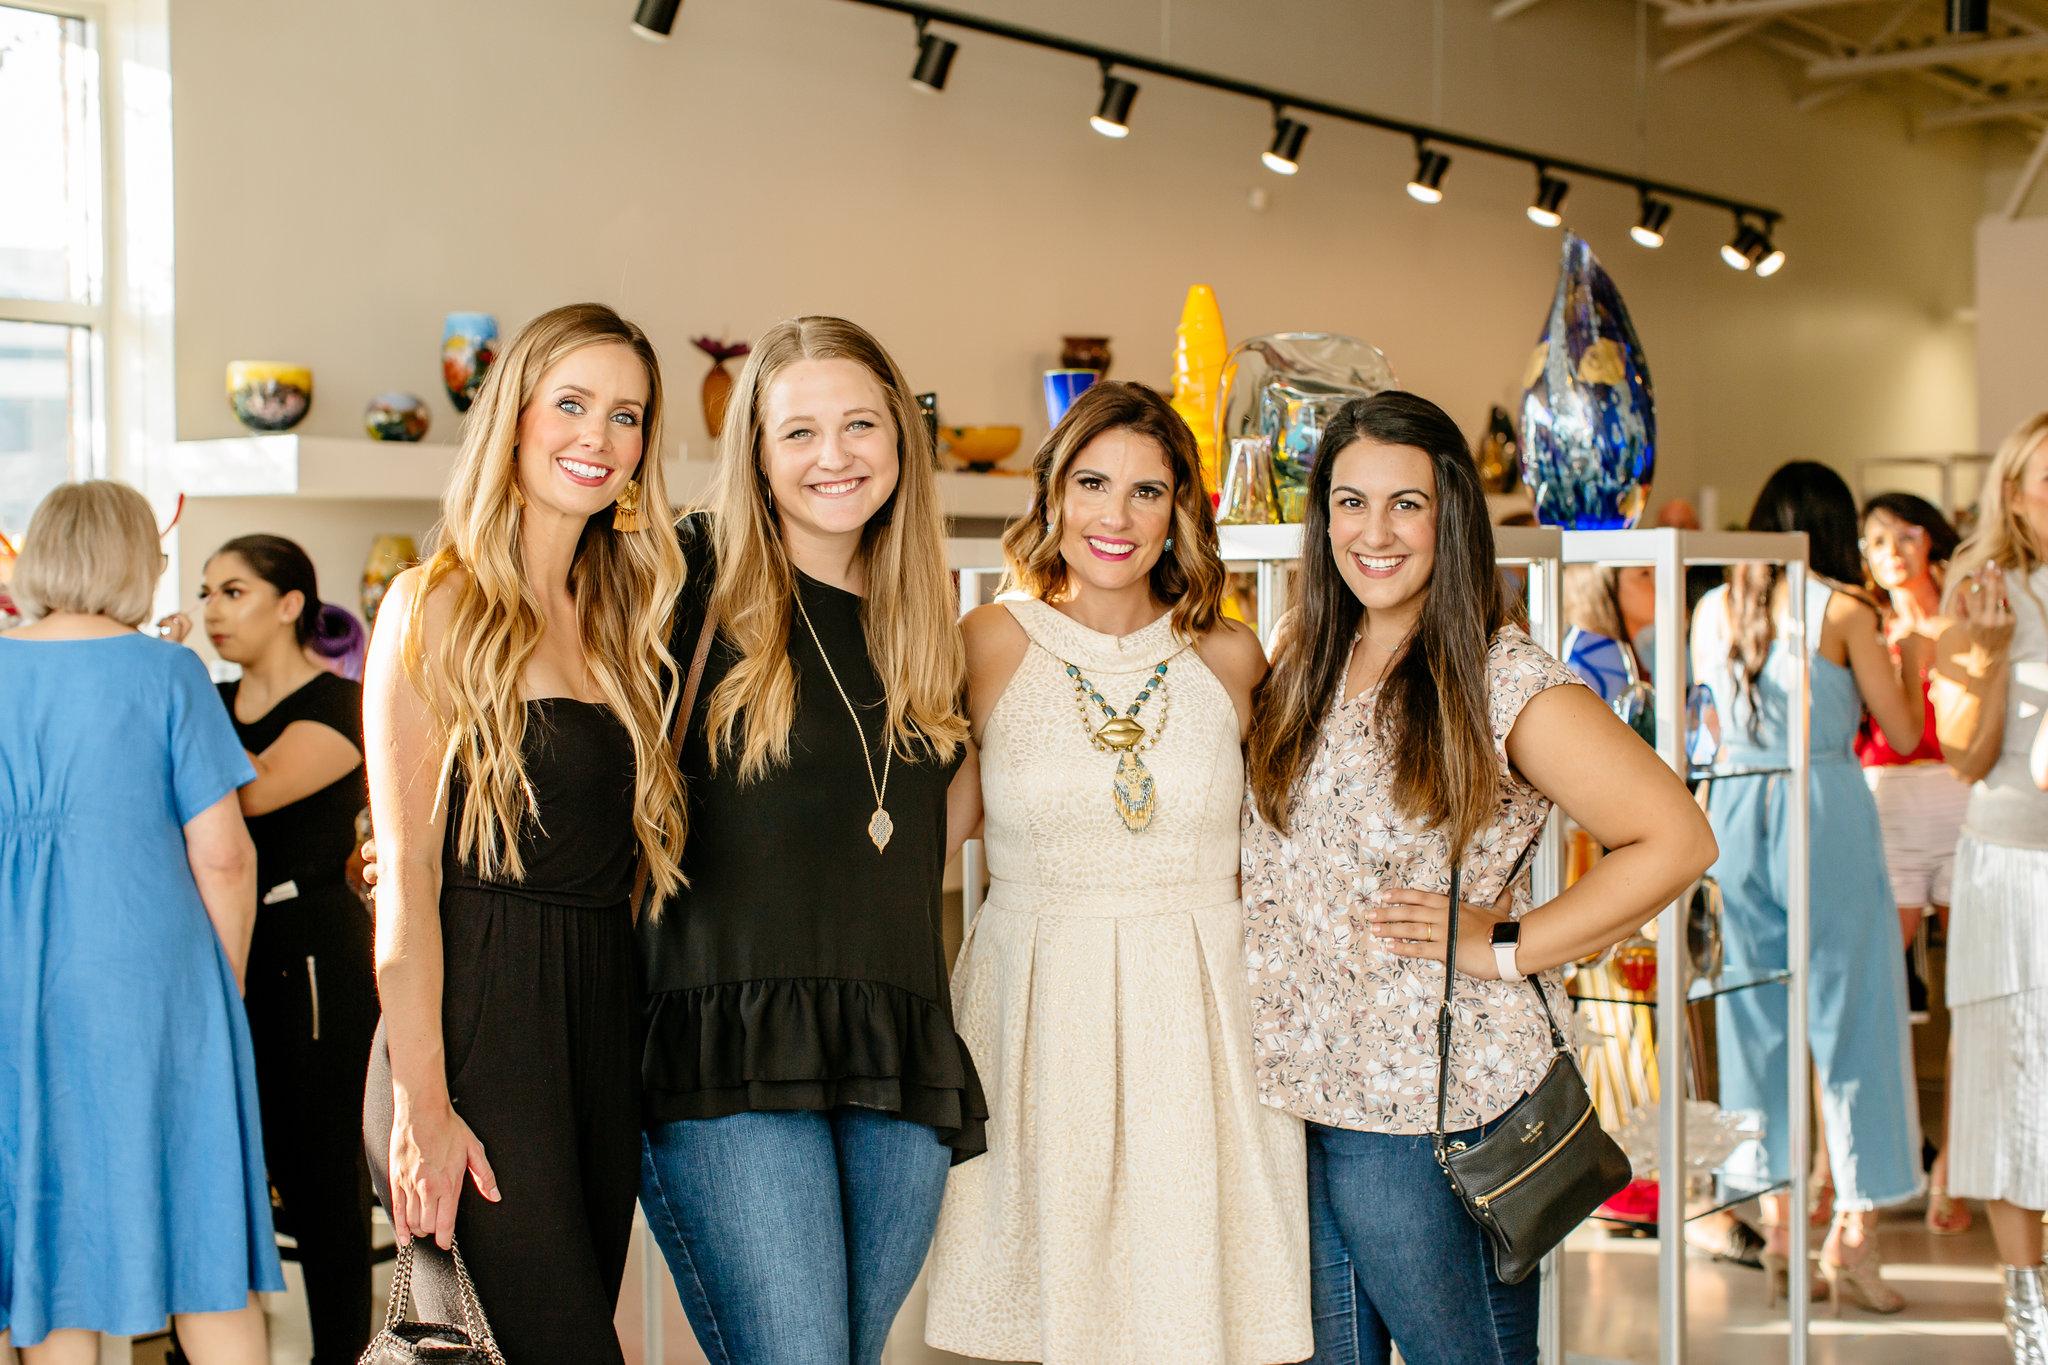 Alexa-Vossler-Photo_Dallas-Event-Photographer_Brite-Bar-Beauty-2018-Lipstick-Launch-Party-19.jpg